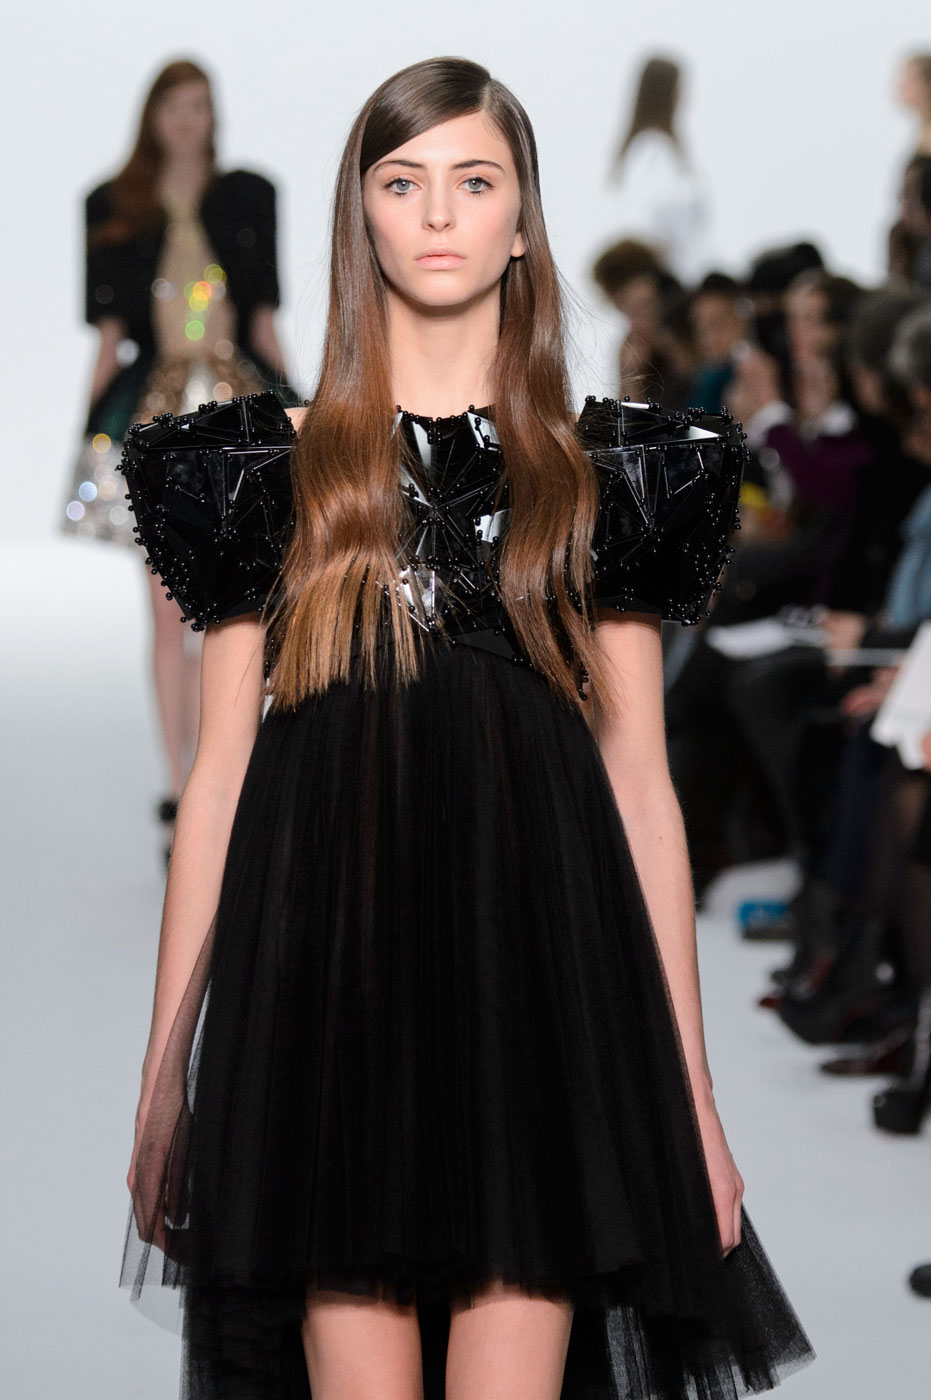 Kayek-fashion-runway-show-haute-couture-paris-spring-summer-2015-the-impression-34